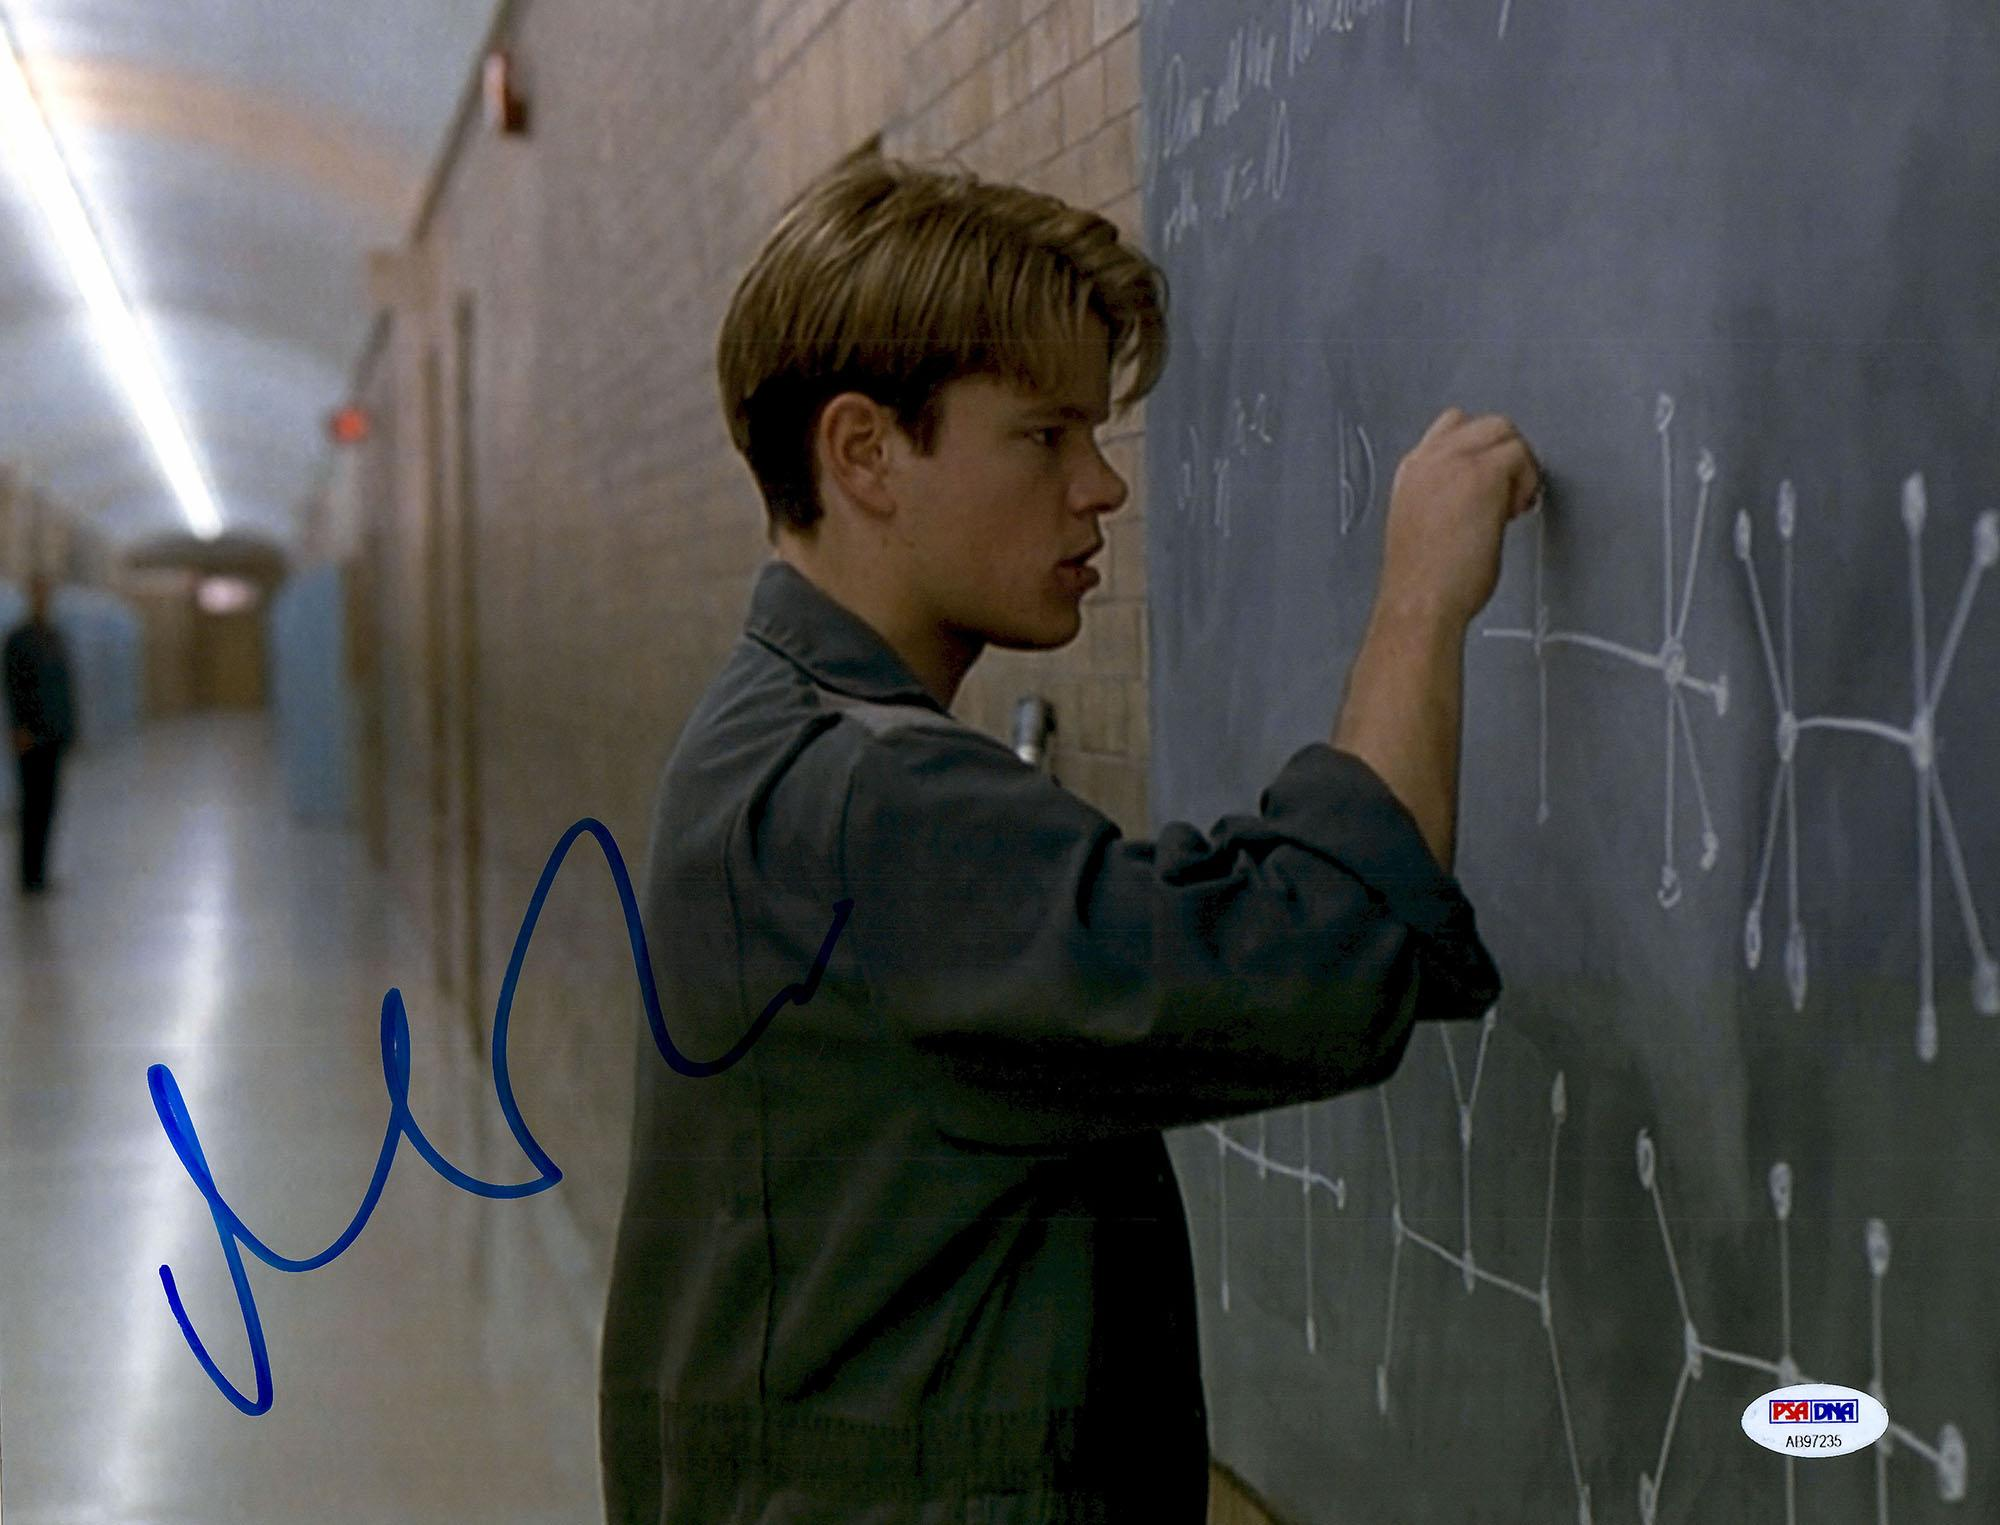 "Matt Damon Autographed 11"" x 14"" Good Will Hunting Photograph - PSA/DNA"